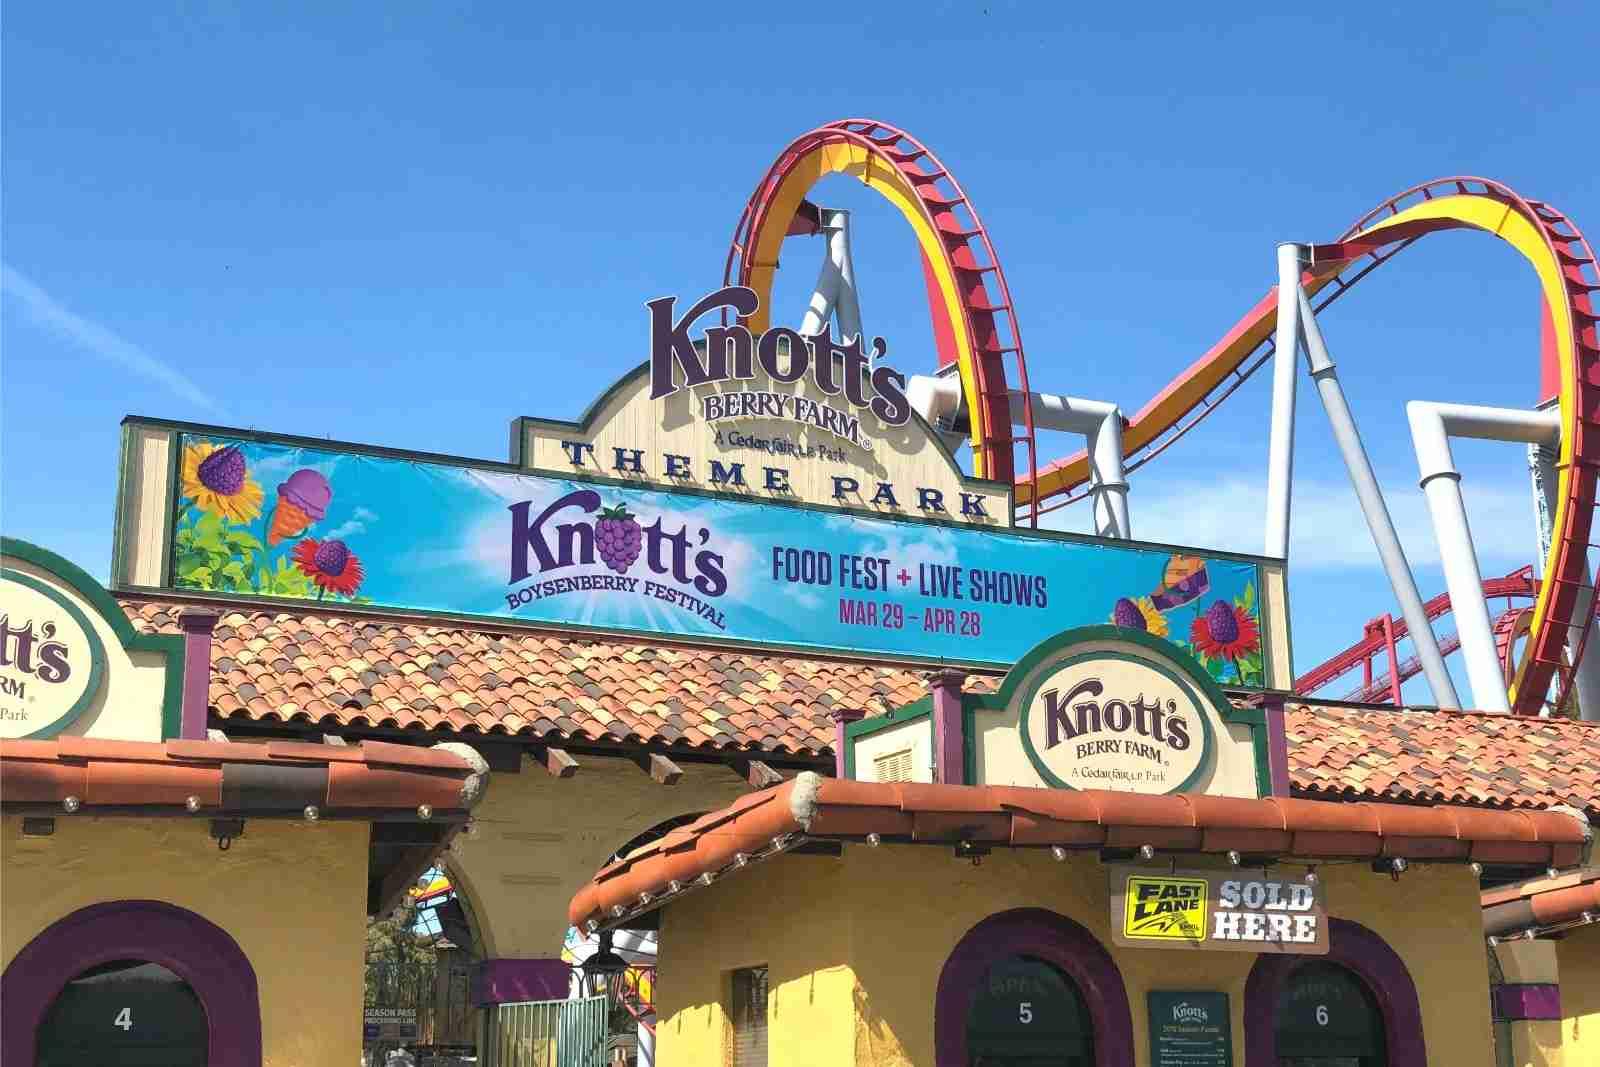 Theme Park Safety - Knotts Berry Farm